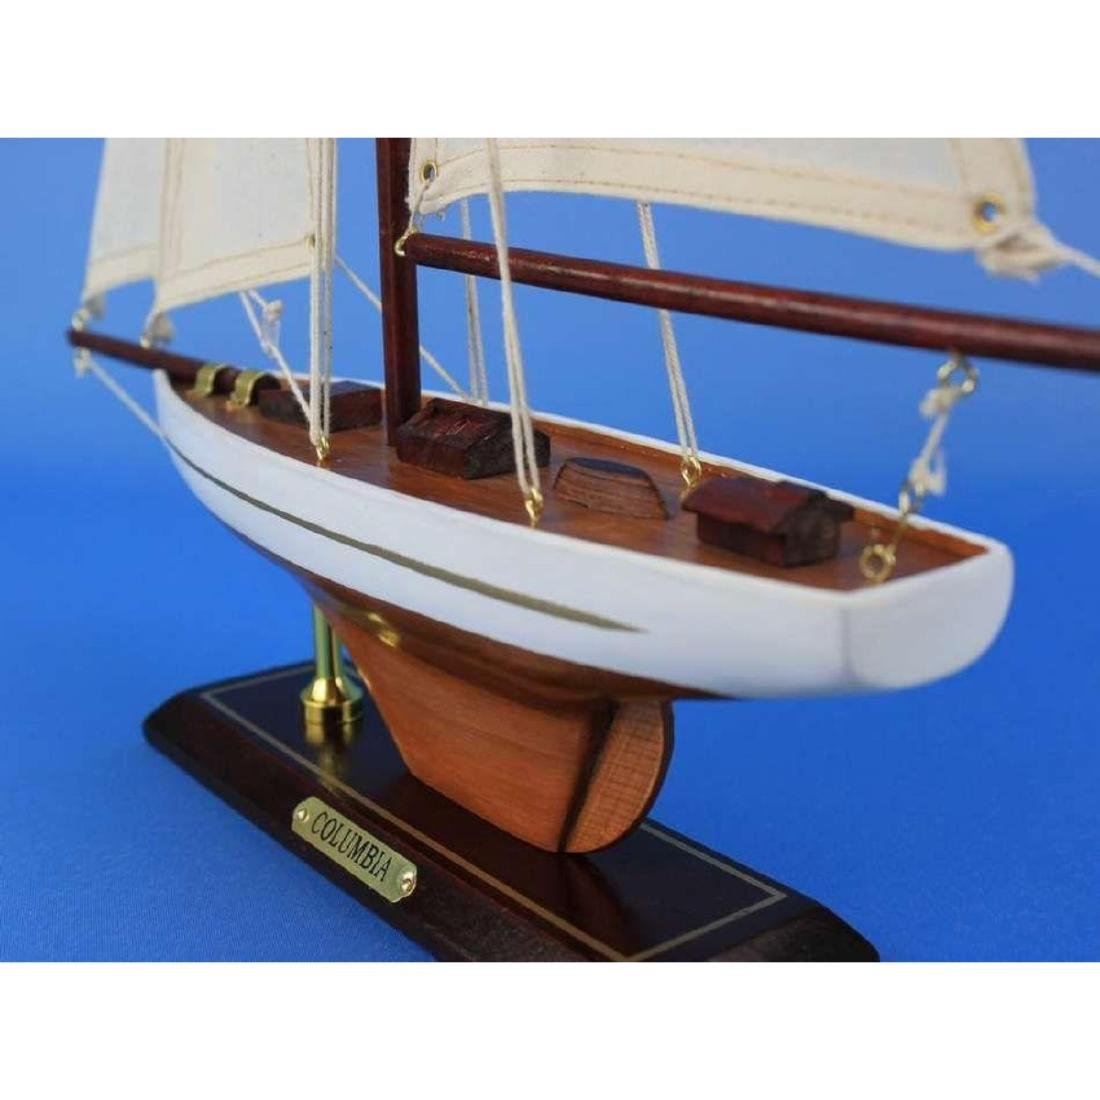 "Wooden Columbia Model Sailboat Decoration 16"" - 6"